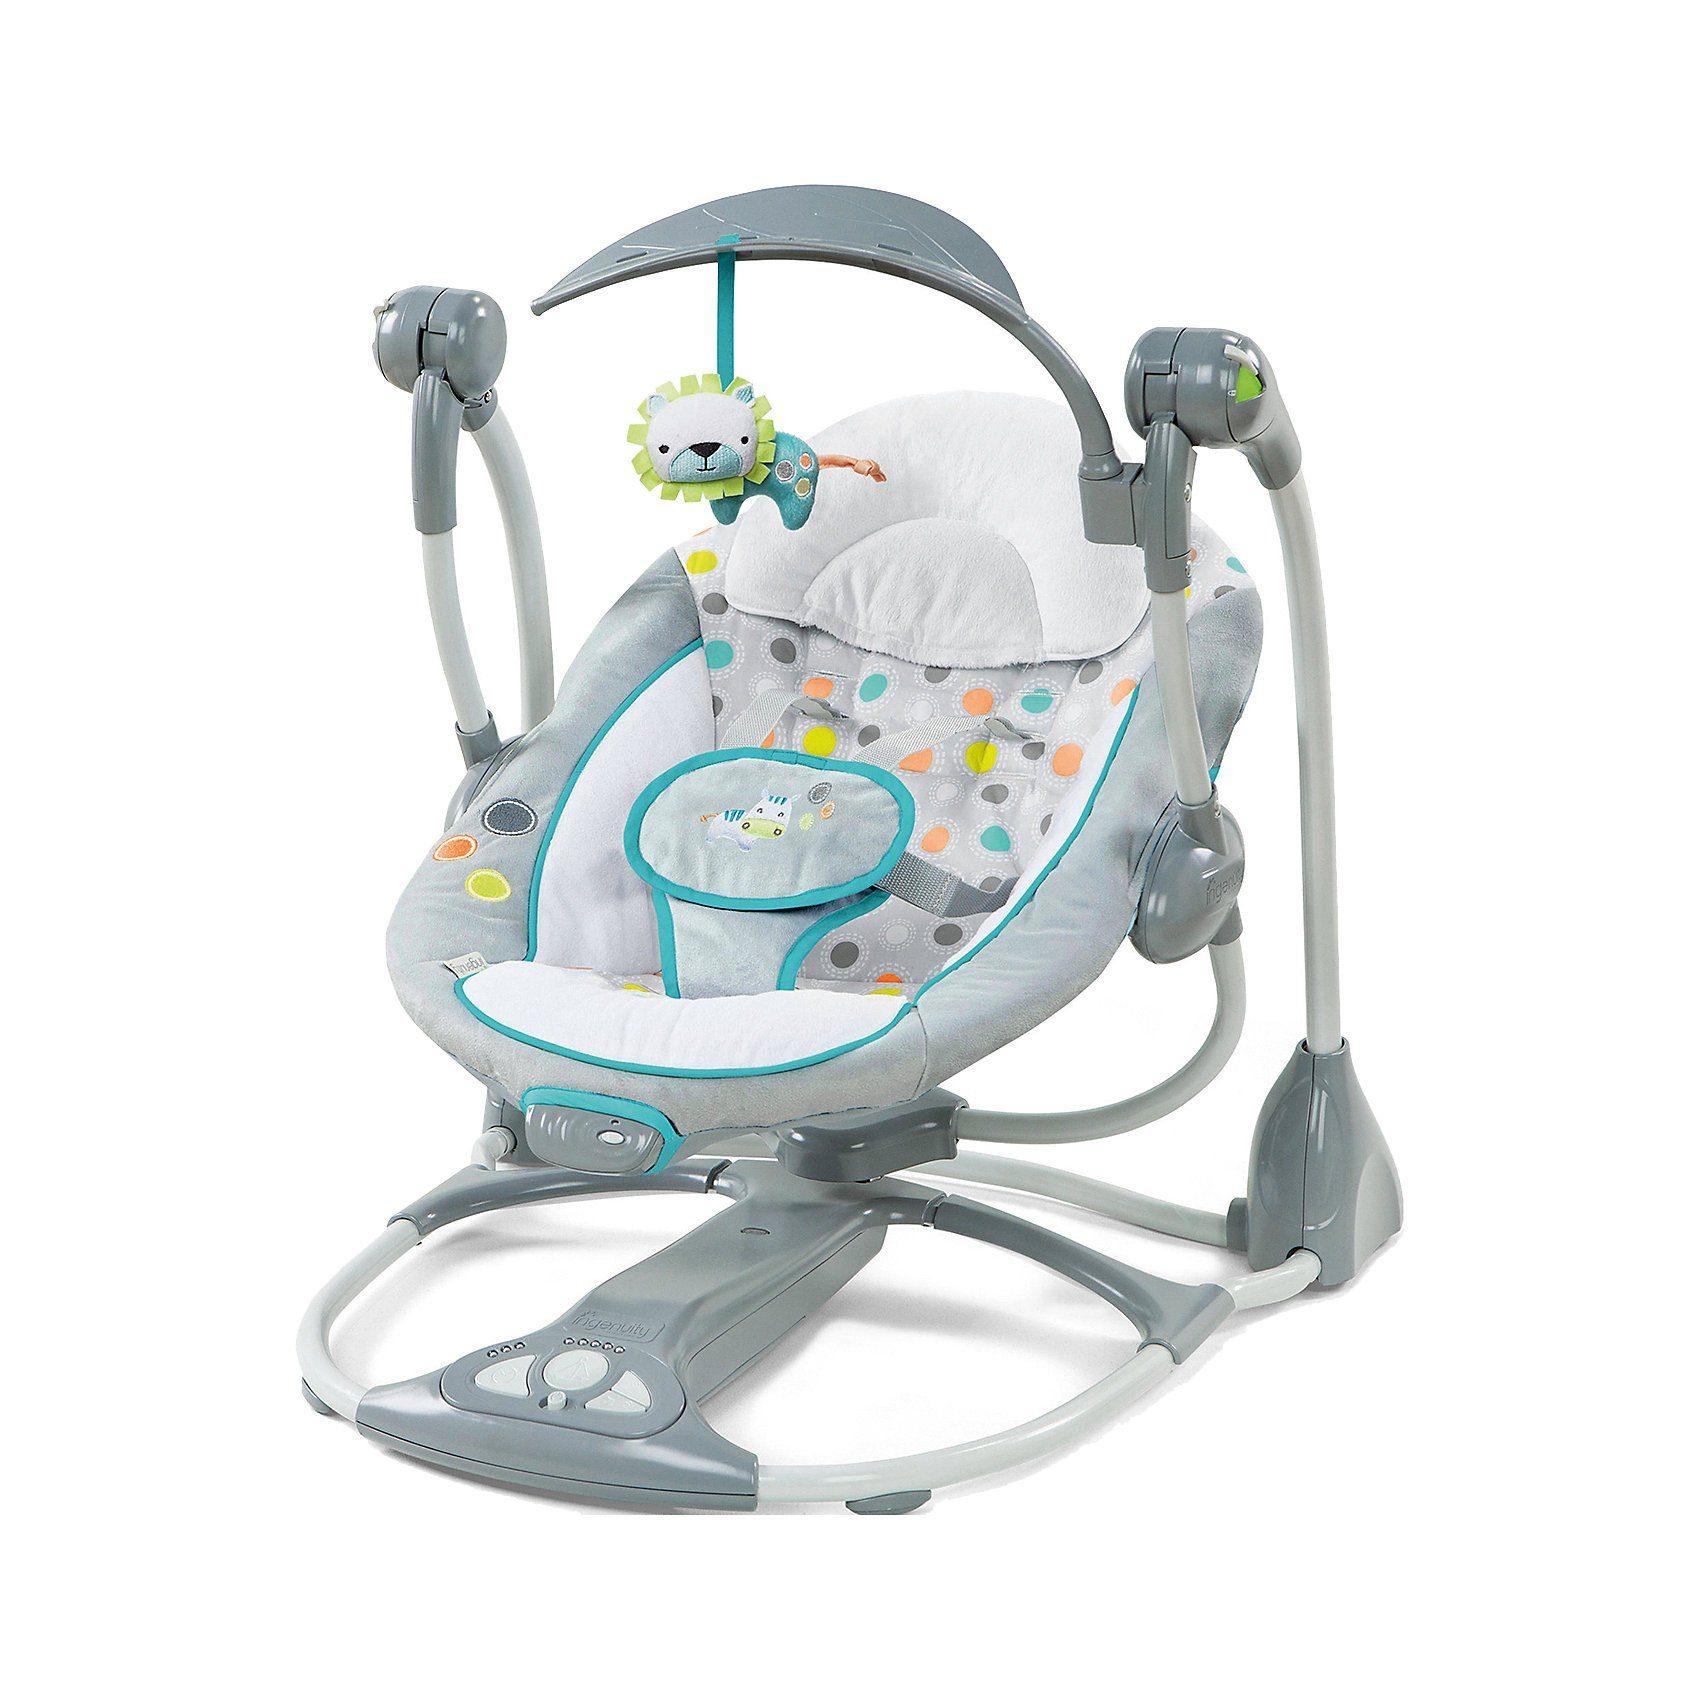 INGENUITY Babyschaukel ConvertMe Swing-2-Seat, Ridgedale